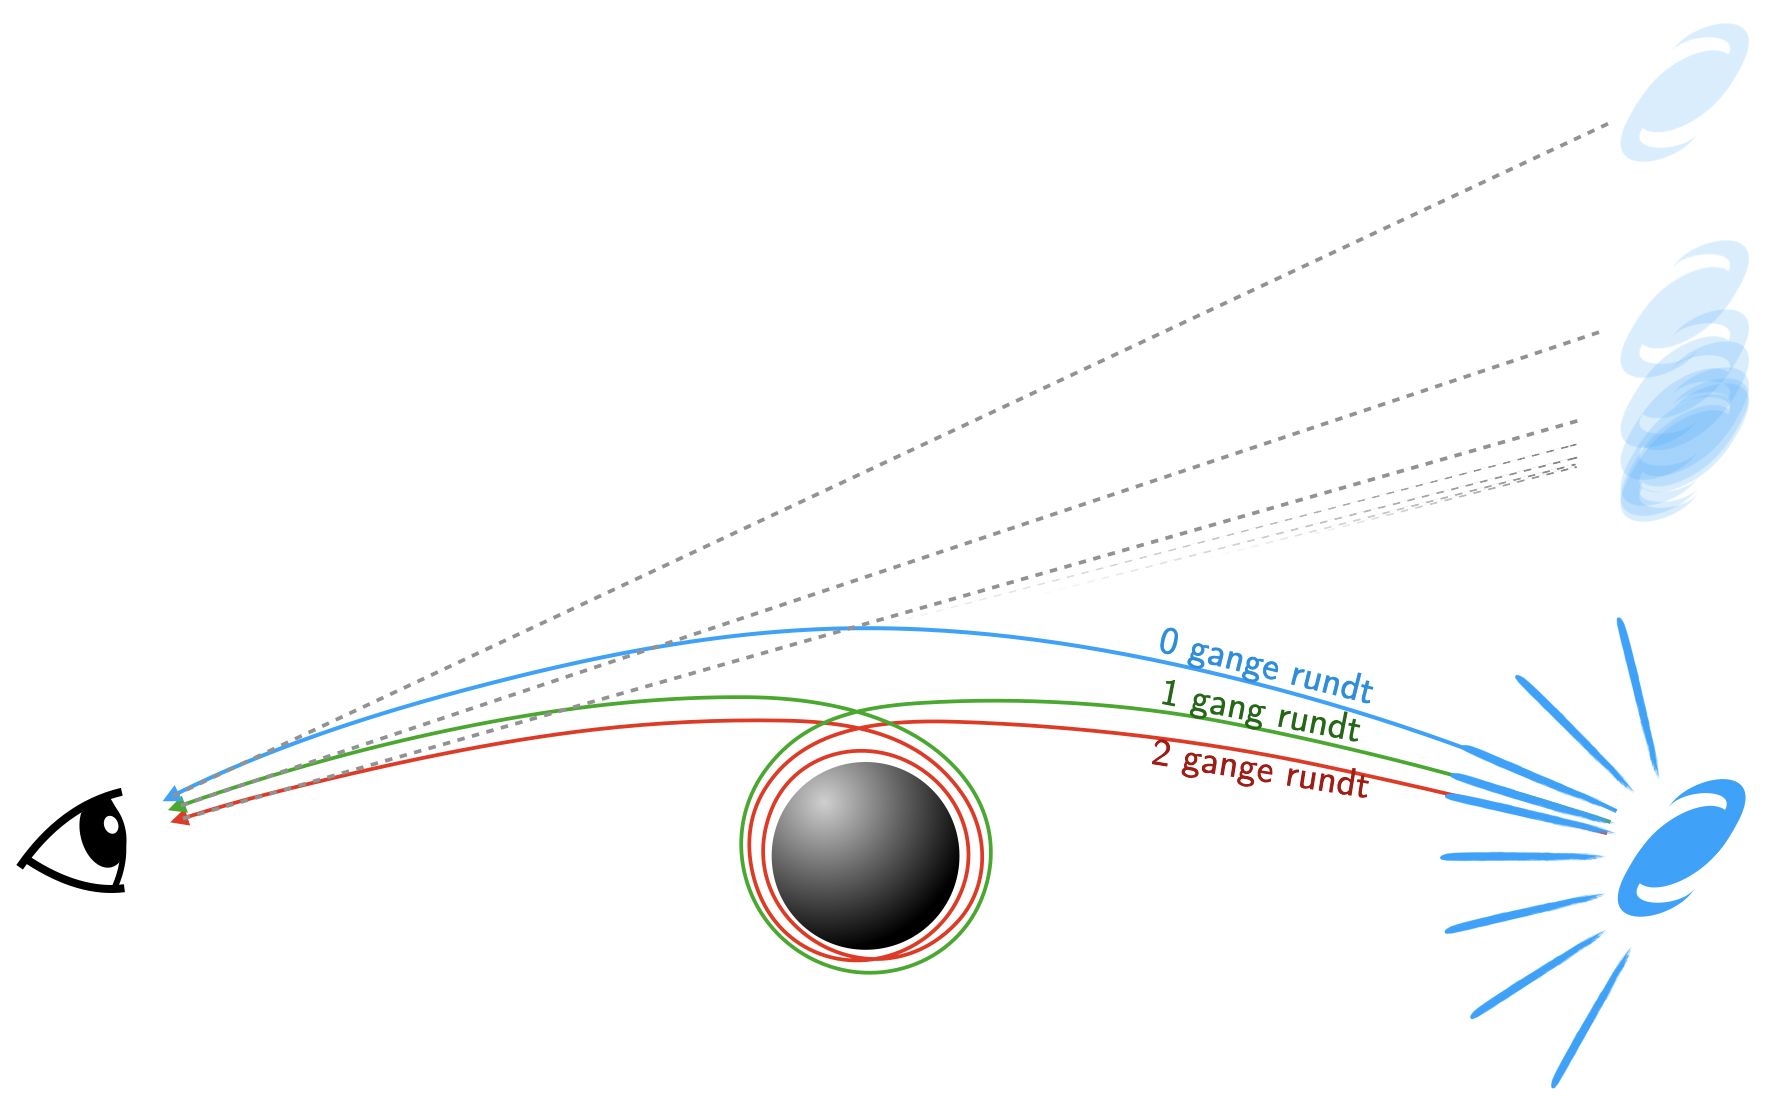 black-hole-multiple-images-1